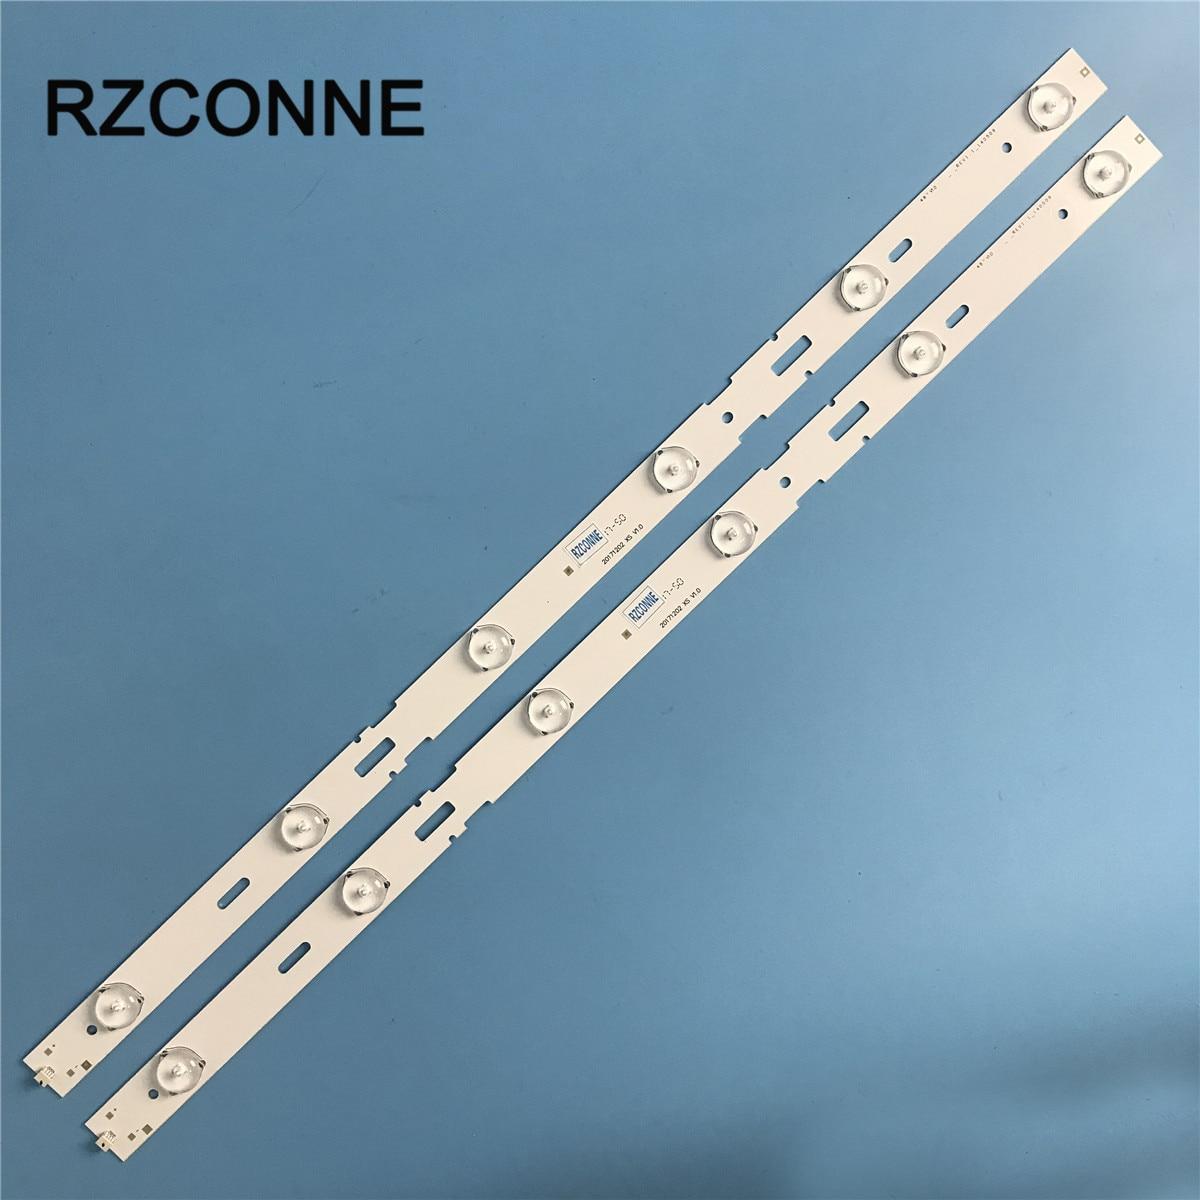 LED Blaklight Strip 2013ARC48_3228N1_6_REV1.1 B48-LW-5433 A48-LB-6436 For Samsung 48'' TV 48VLE5421BG LE48A5000 LSC480HN05